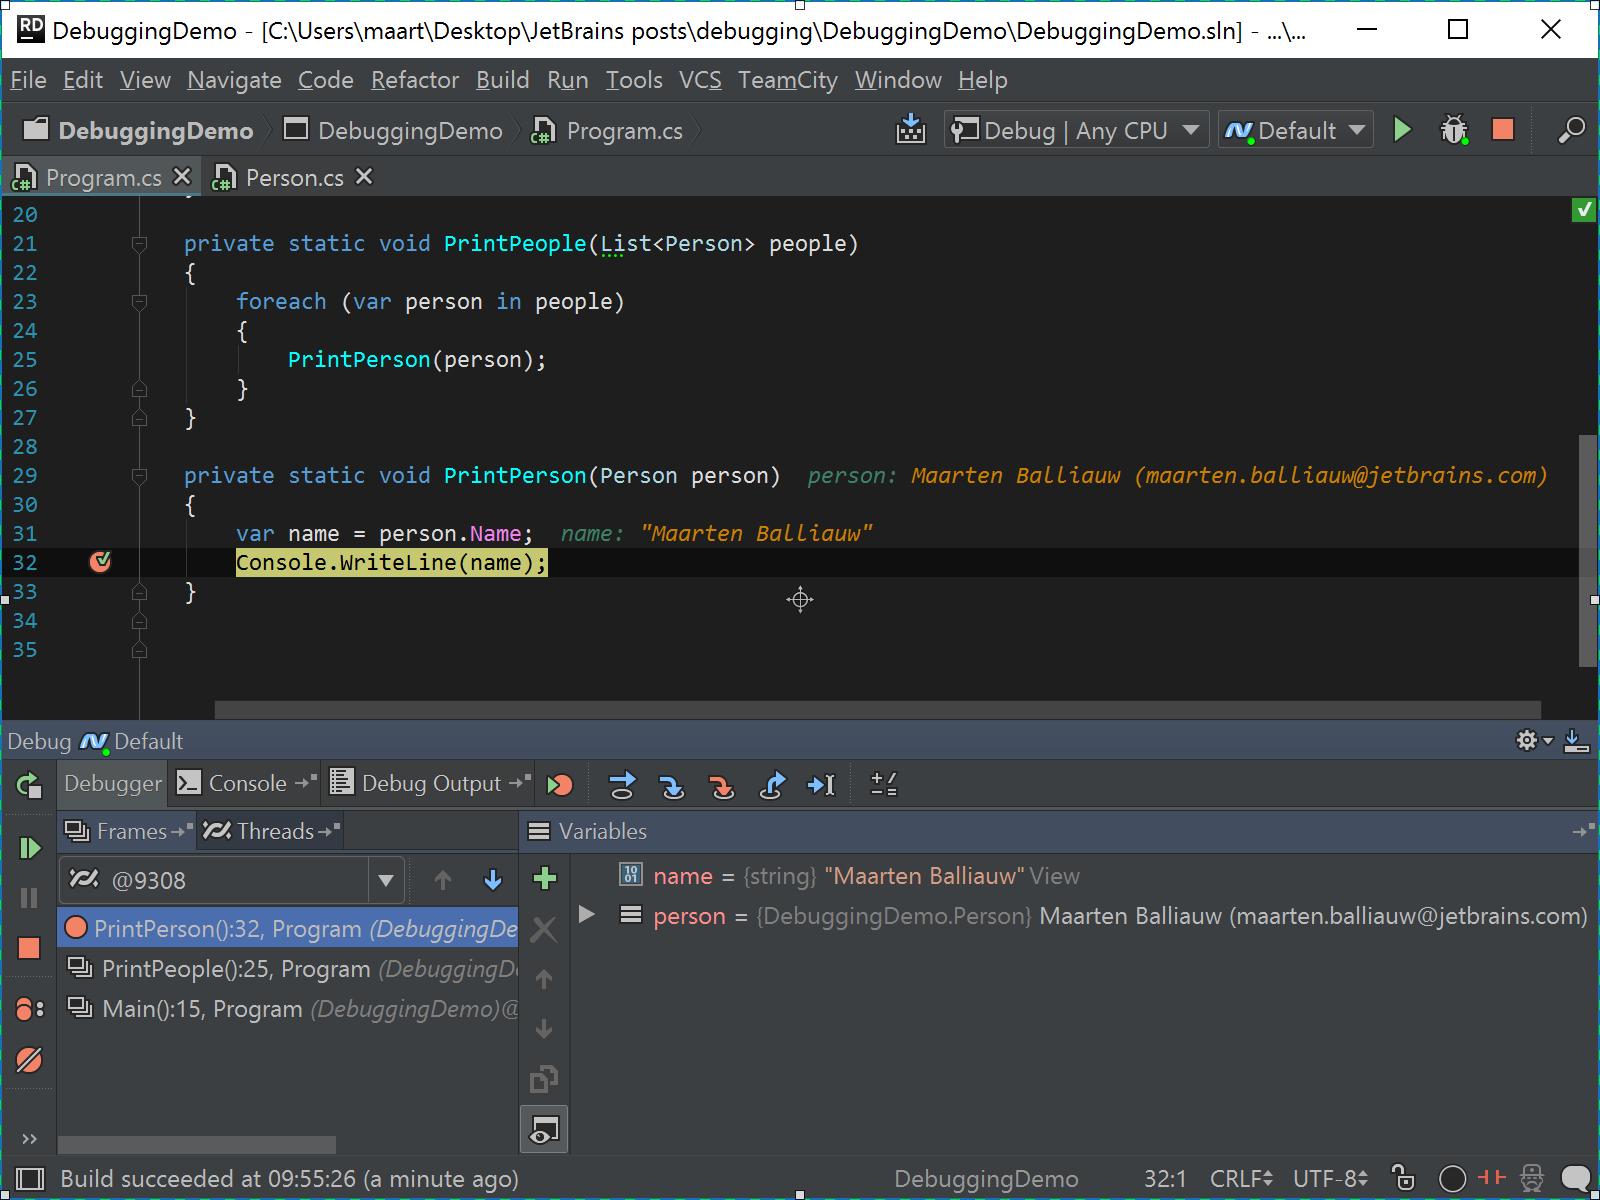 Using DebuggerDisplayAttribute to visualize a variable in the debugger